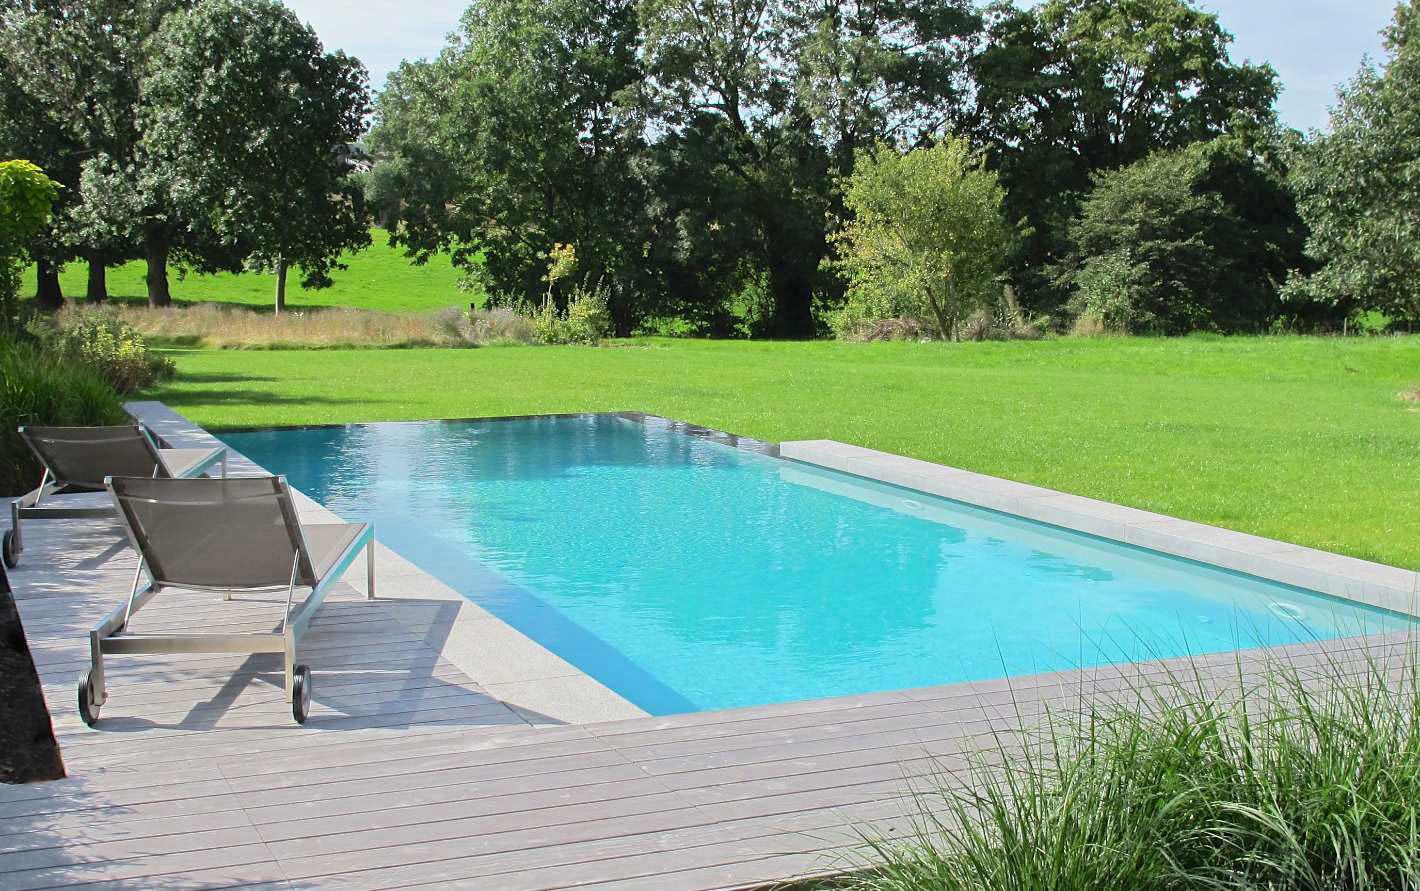 pool farbe alkorplan 2000 hellgrau pool more gmbh. Black Bedroom Furniture Sets. Home Design Ideas